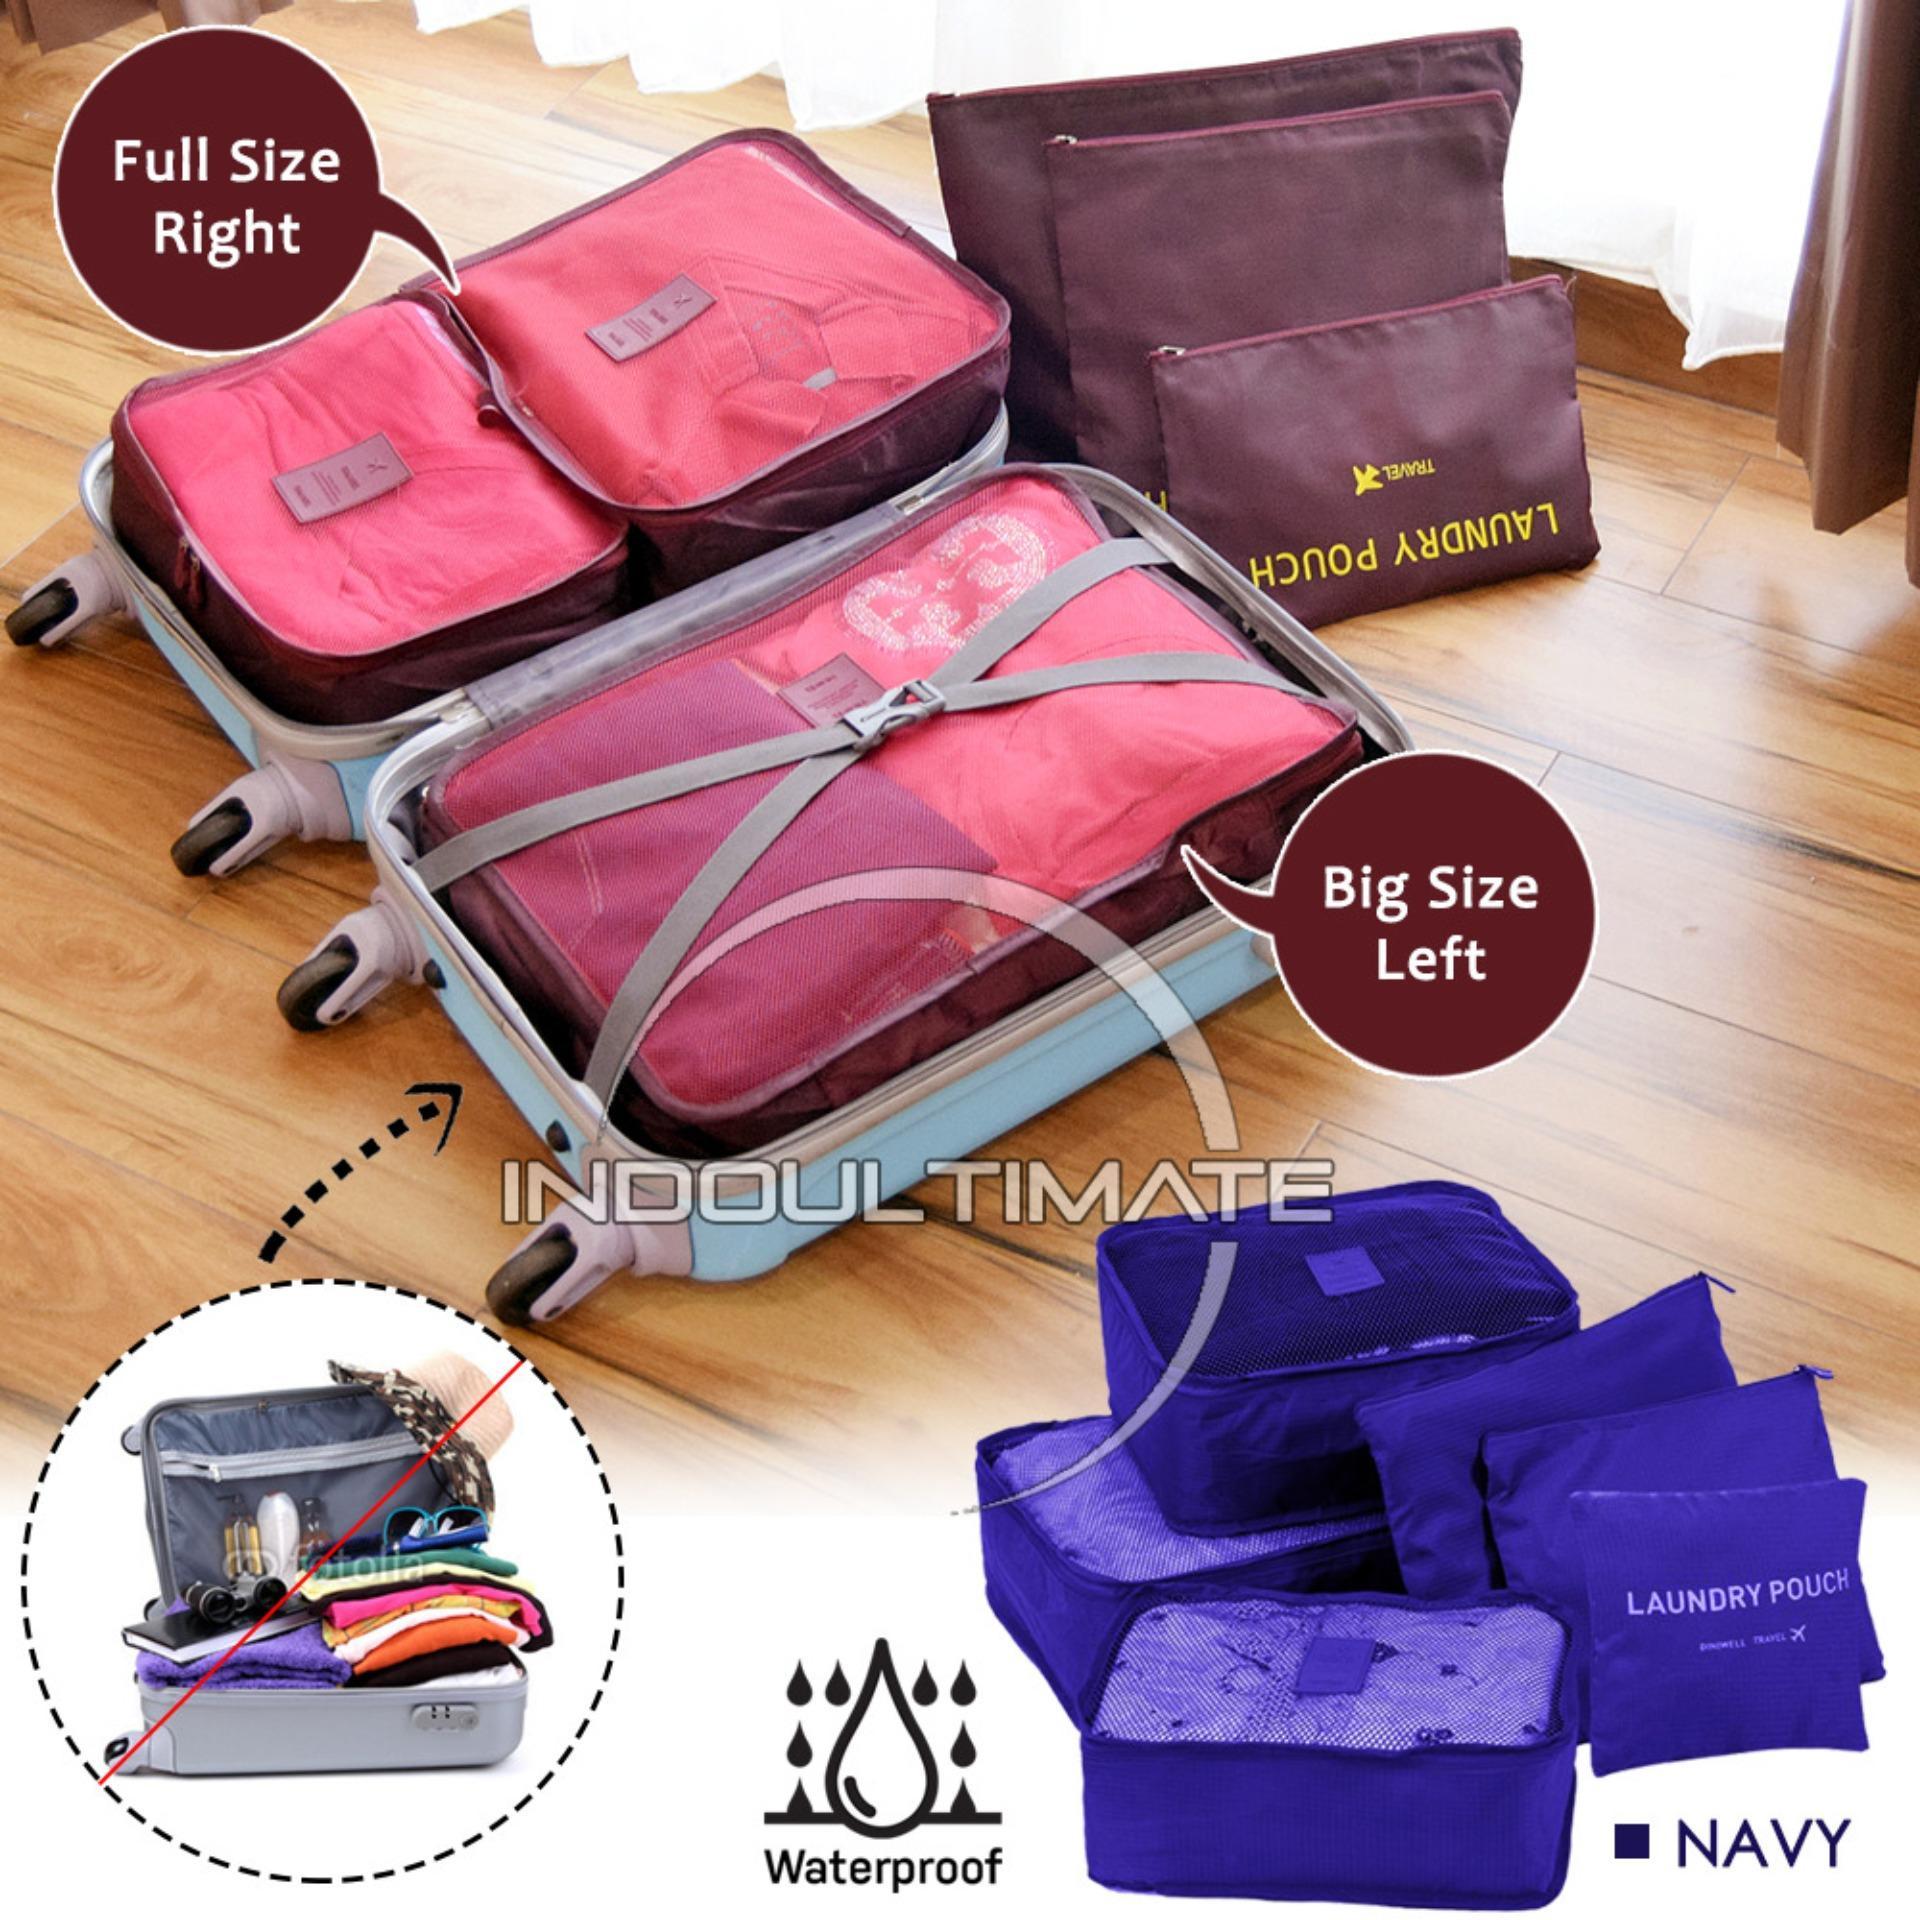 Ultimate Travel Bag 6in1 Organizer OR 60-01 / Organizer Space Koper 1 Set -